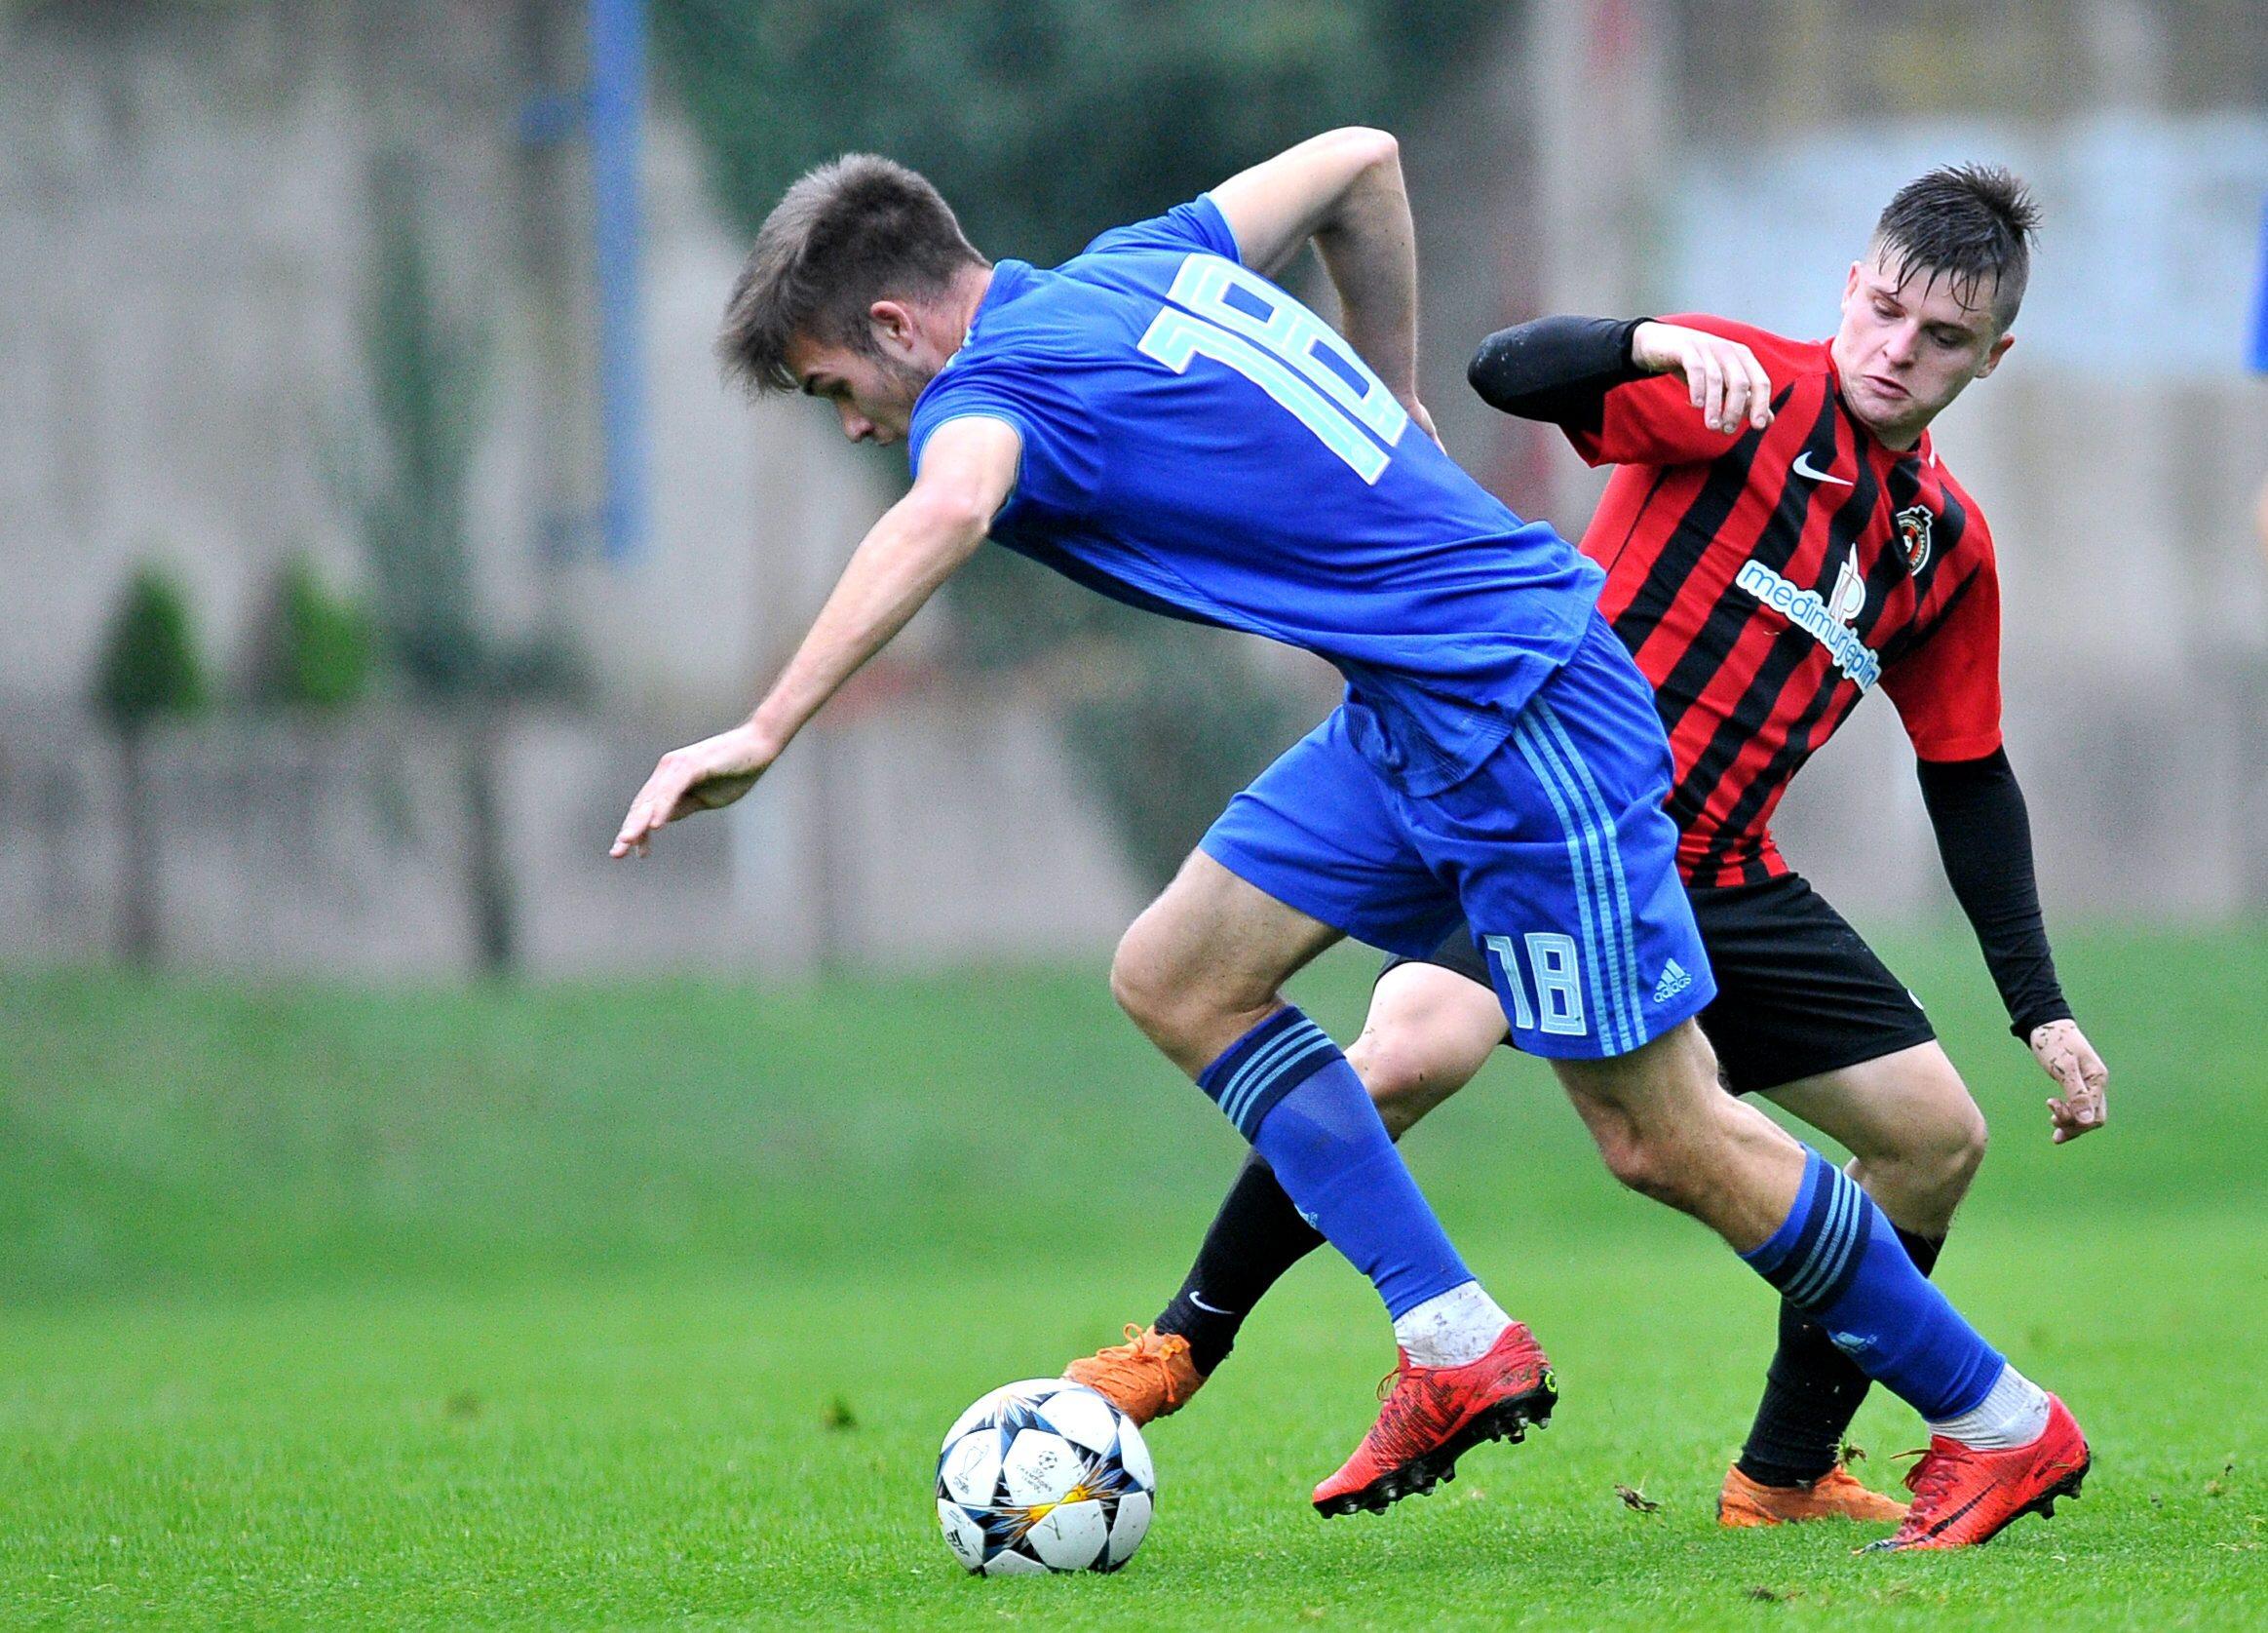 Mario Ćuže u Dinamovom dresu